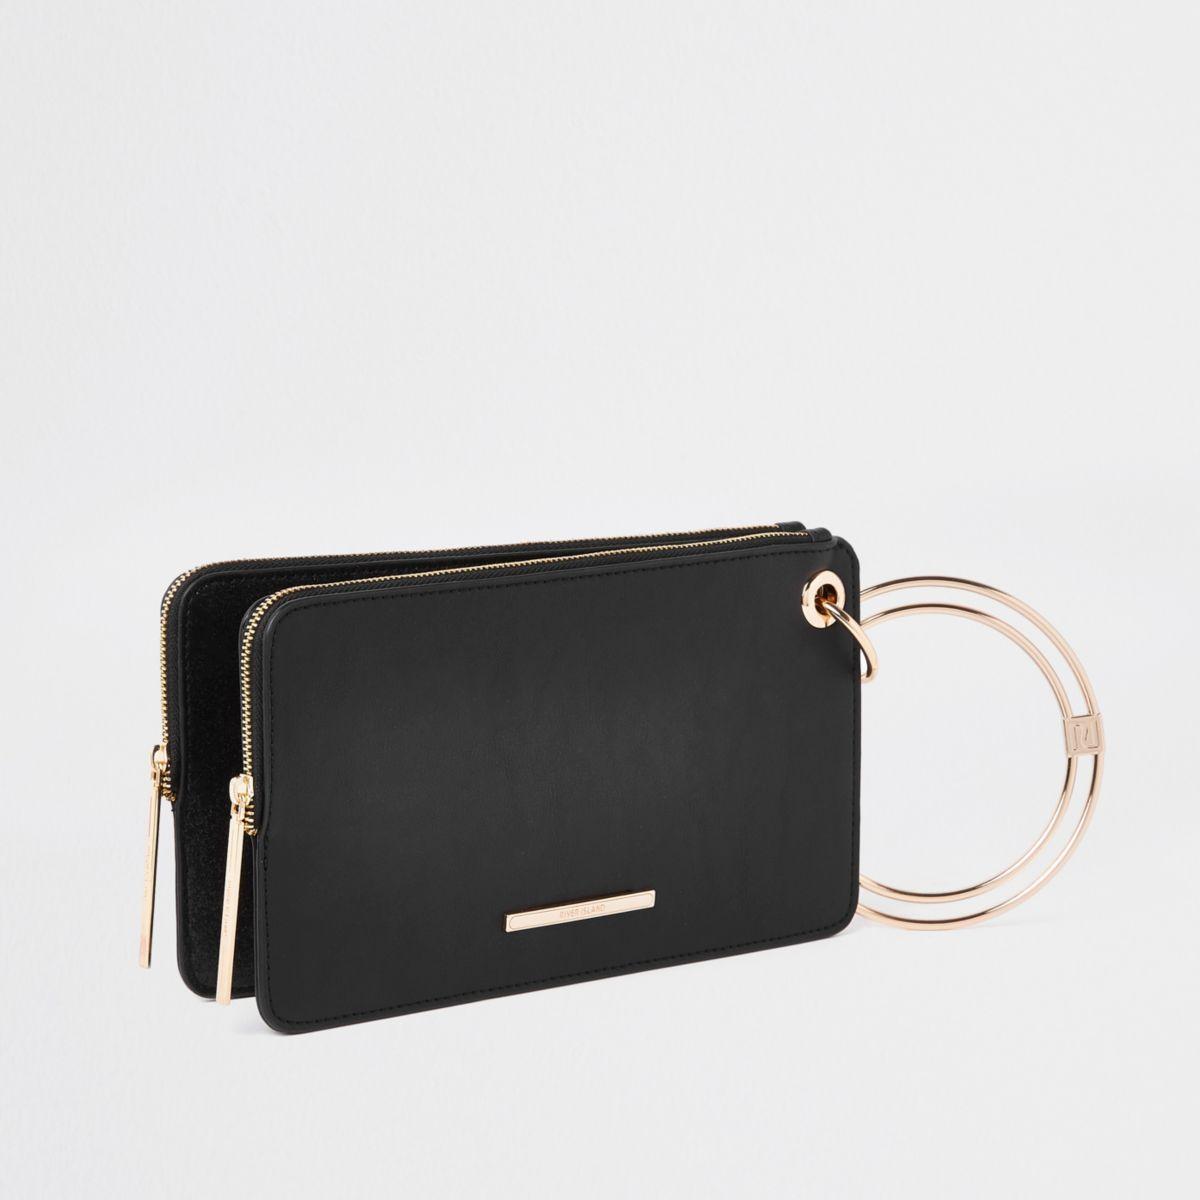 Black glitter wristlet pouch